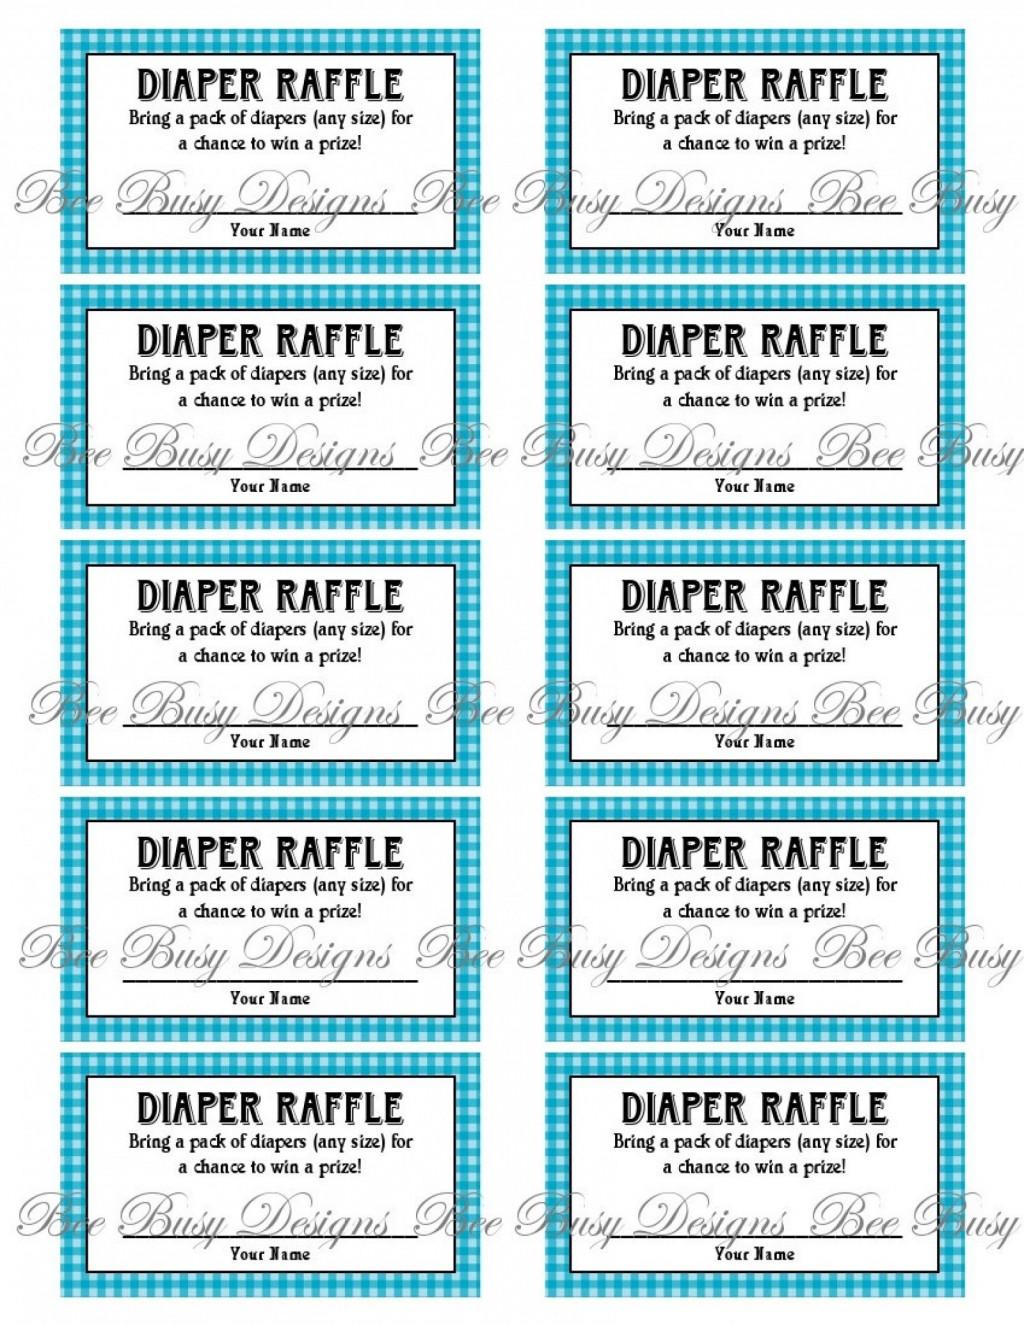 009 Astounding Diaper Raffle Ticket Template High Resolution  Boy Free Printable Print Black And WhiteLarge